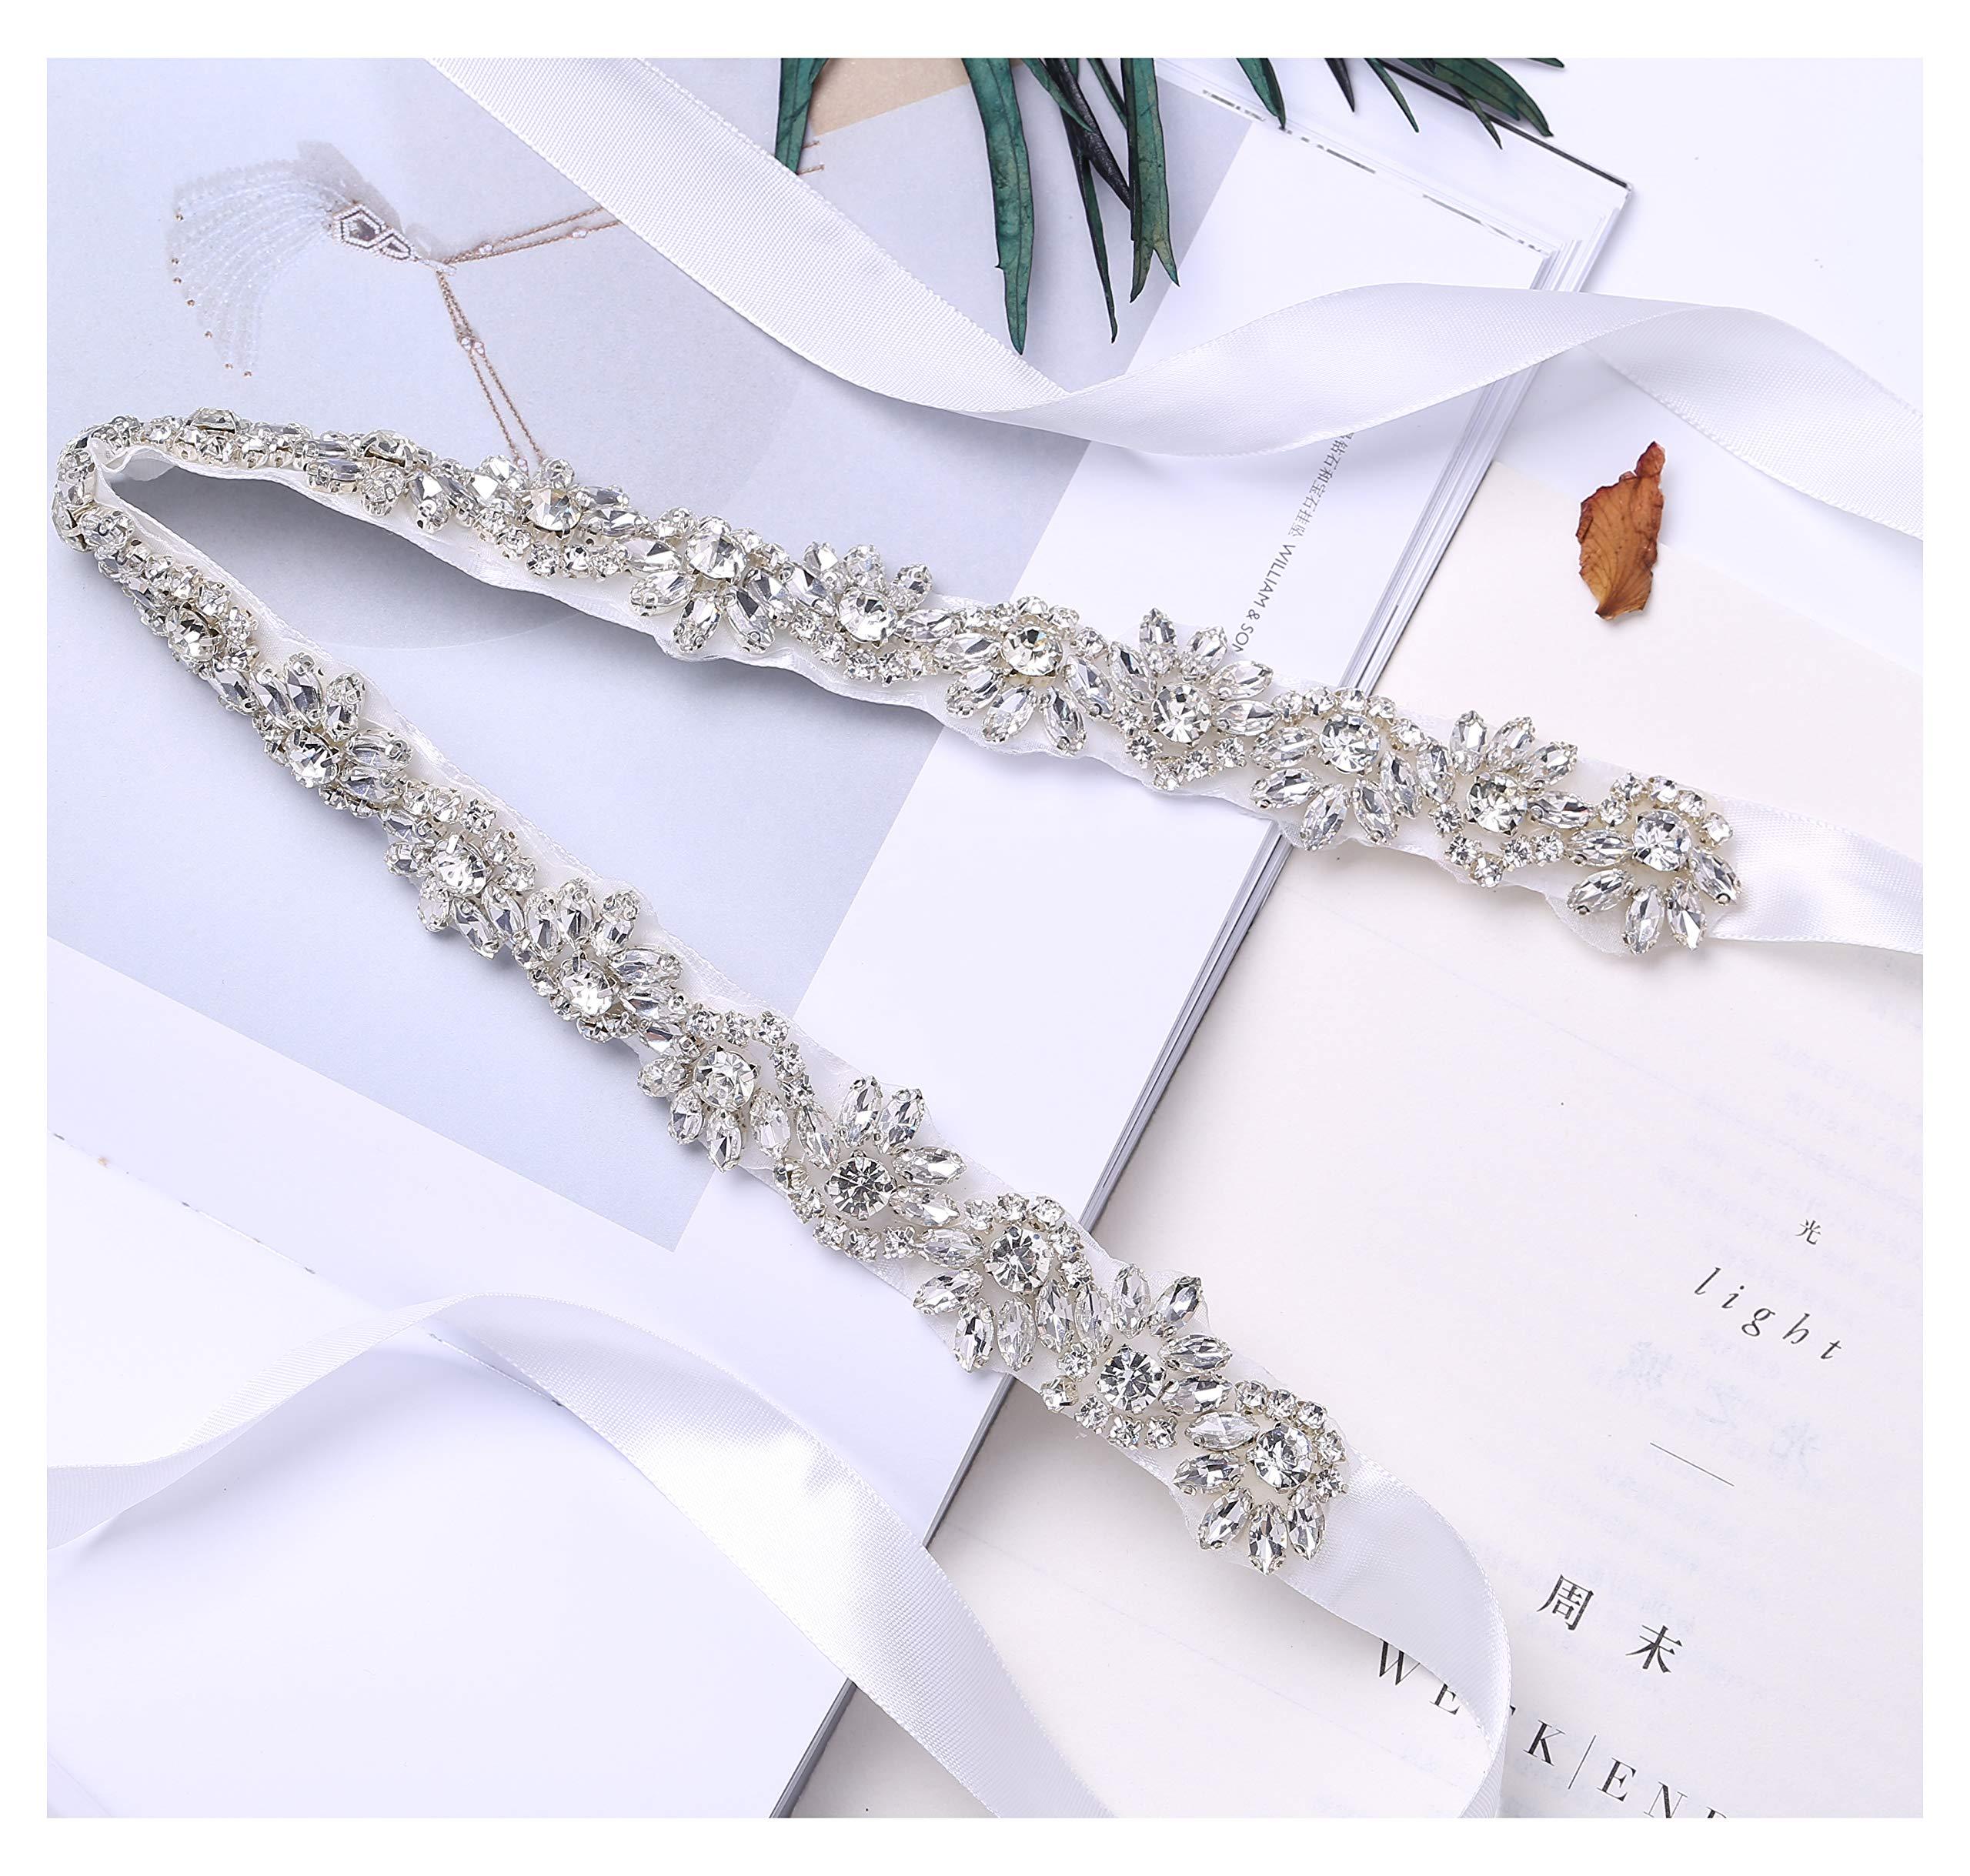 Fruit And Sun Handmade Beads Wedding Belt evening belt With Rhinestones (White)